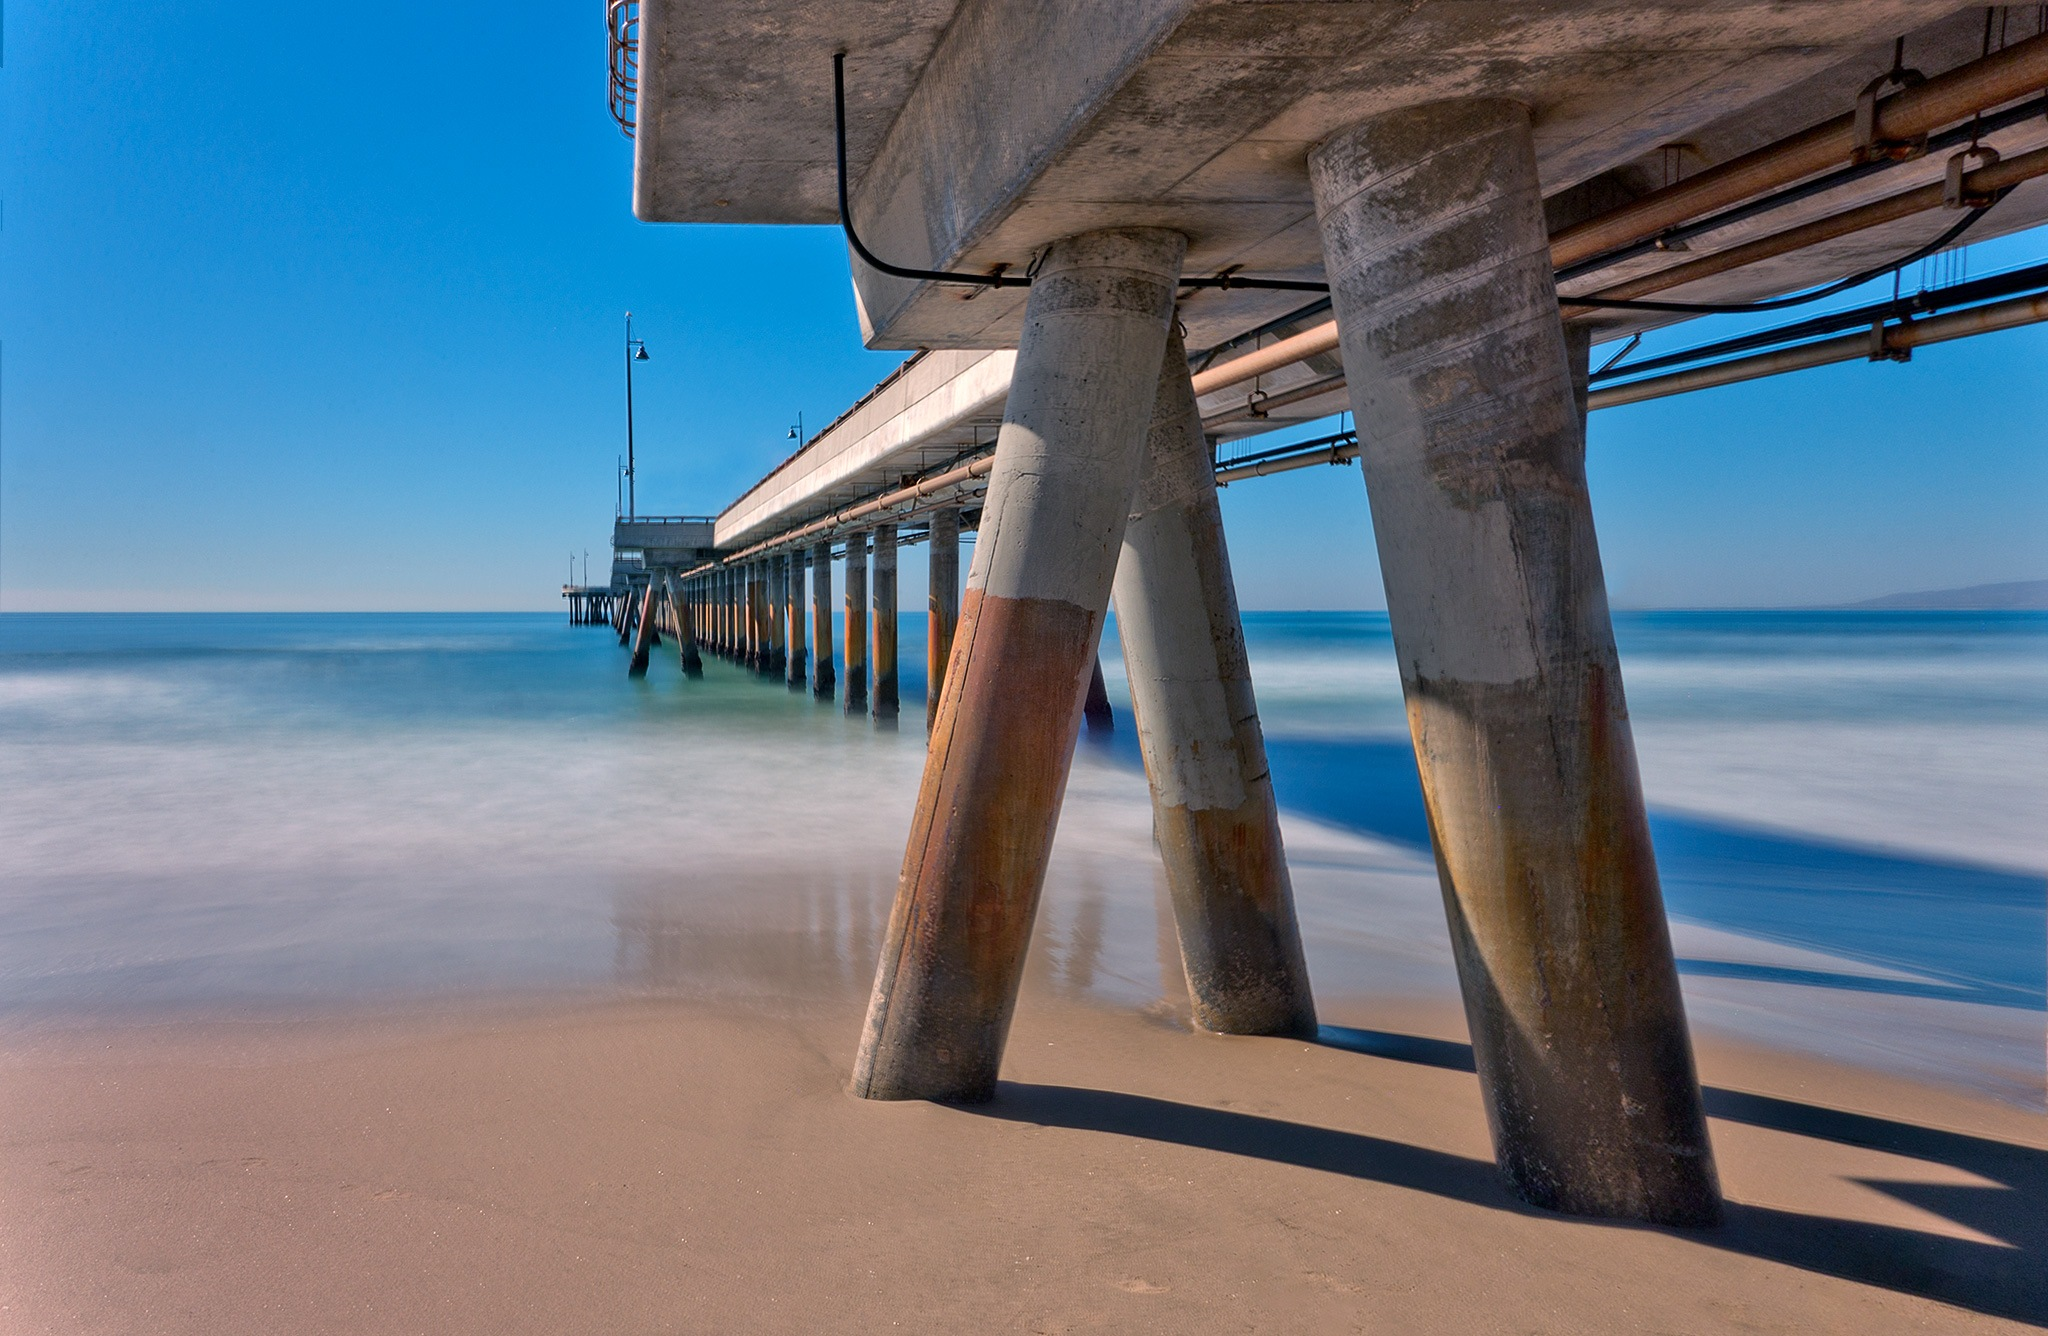 Photo in Sea and Sand #summer #ocean #pacific #waves #water #blue #cyan #foam #sky #clear #pier #architecture #pillars #columns #empty #vivid #vibrant #deserted #californisa #california #los angeles #la #ca